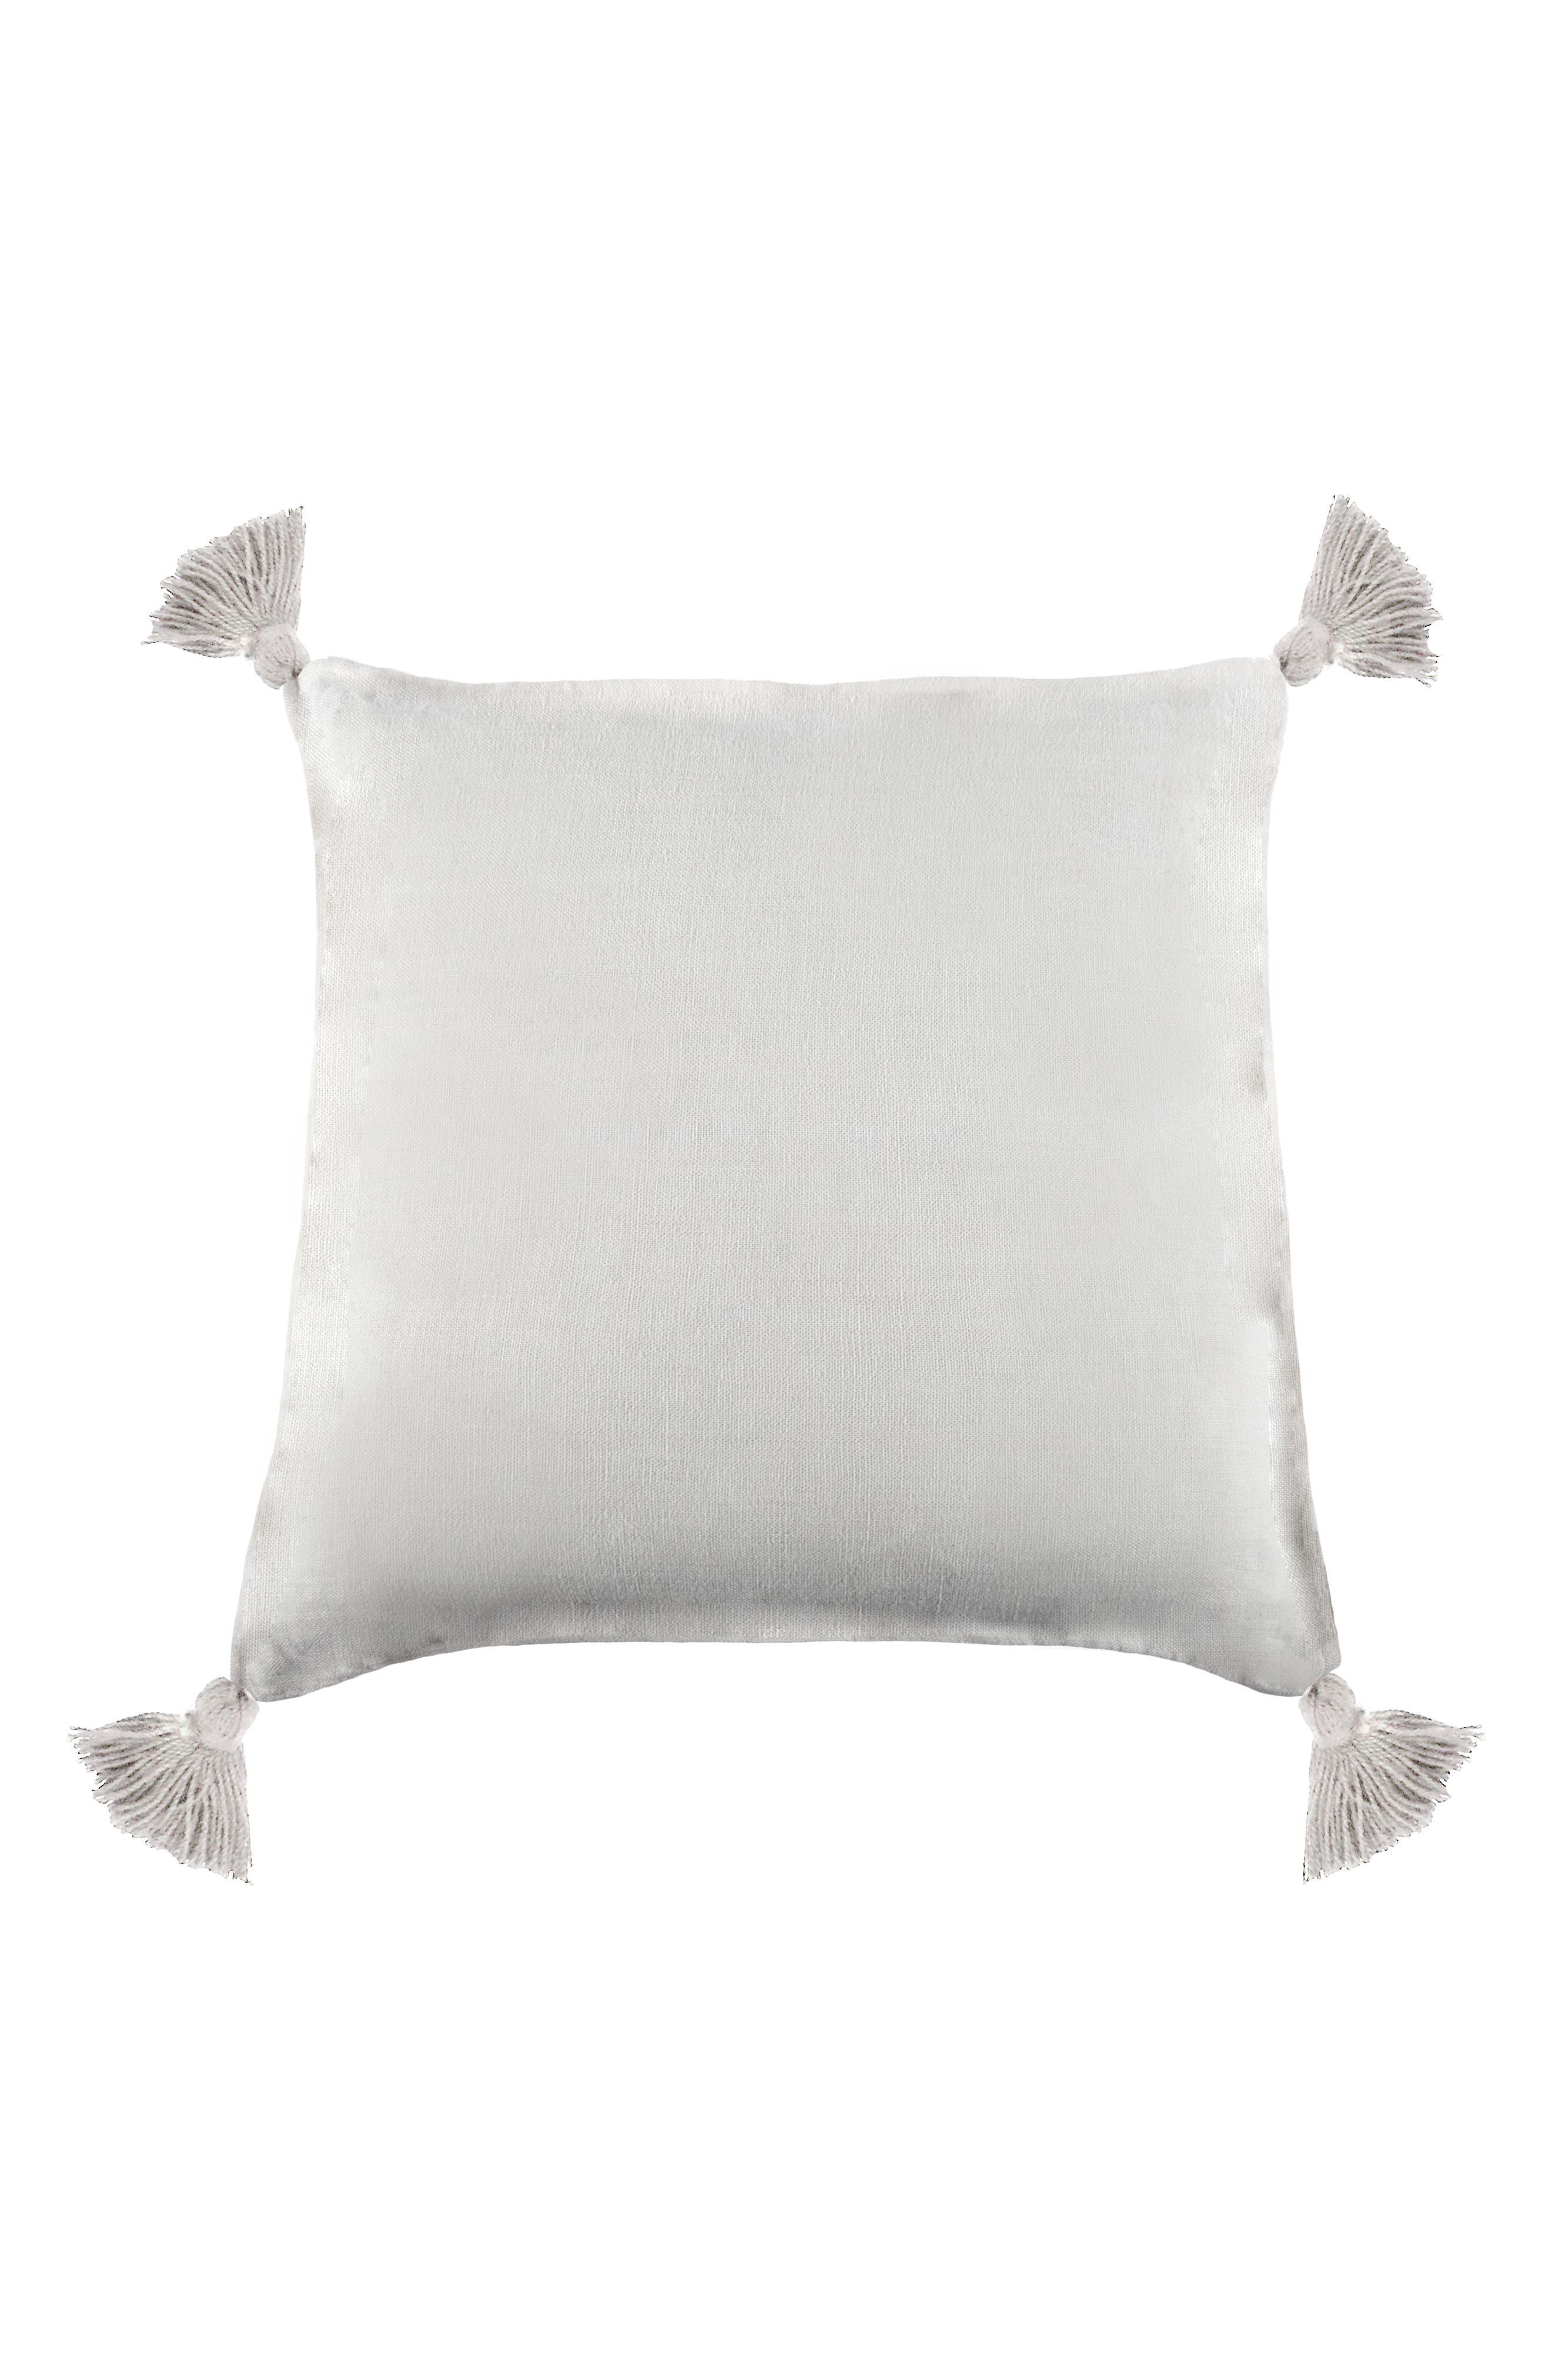 POM POM AT HOME, Montauk Tassel Accent Pillow, Main thumbnail 1, color, WHITE